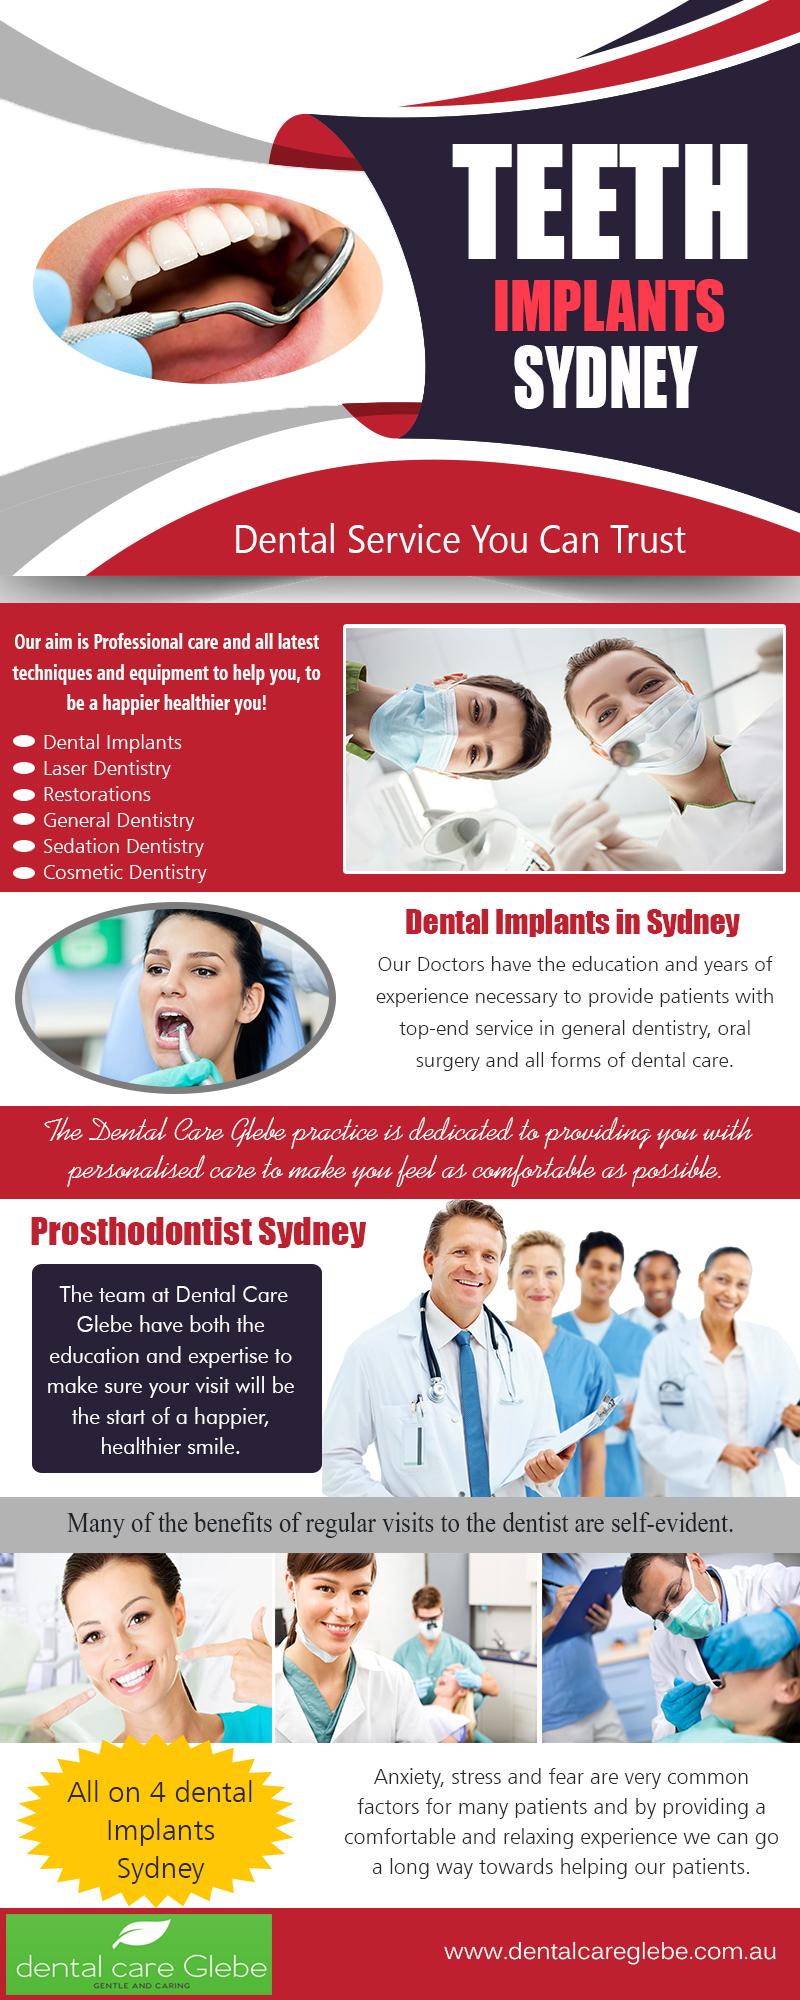 Periodontist In Sydney | Call – 02 9566 2030 | www.dentalcareglebe.com.au